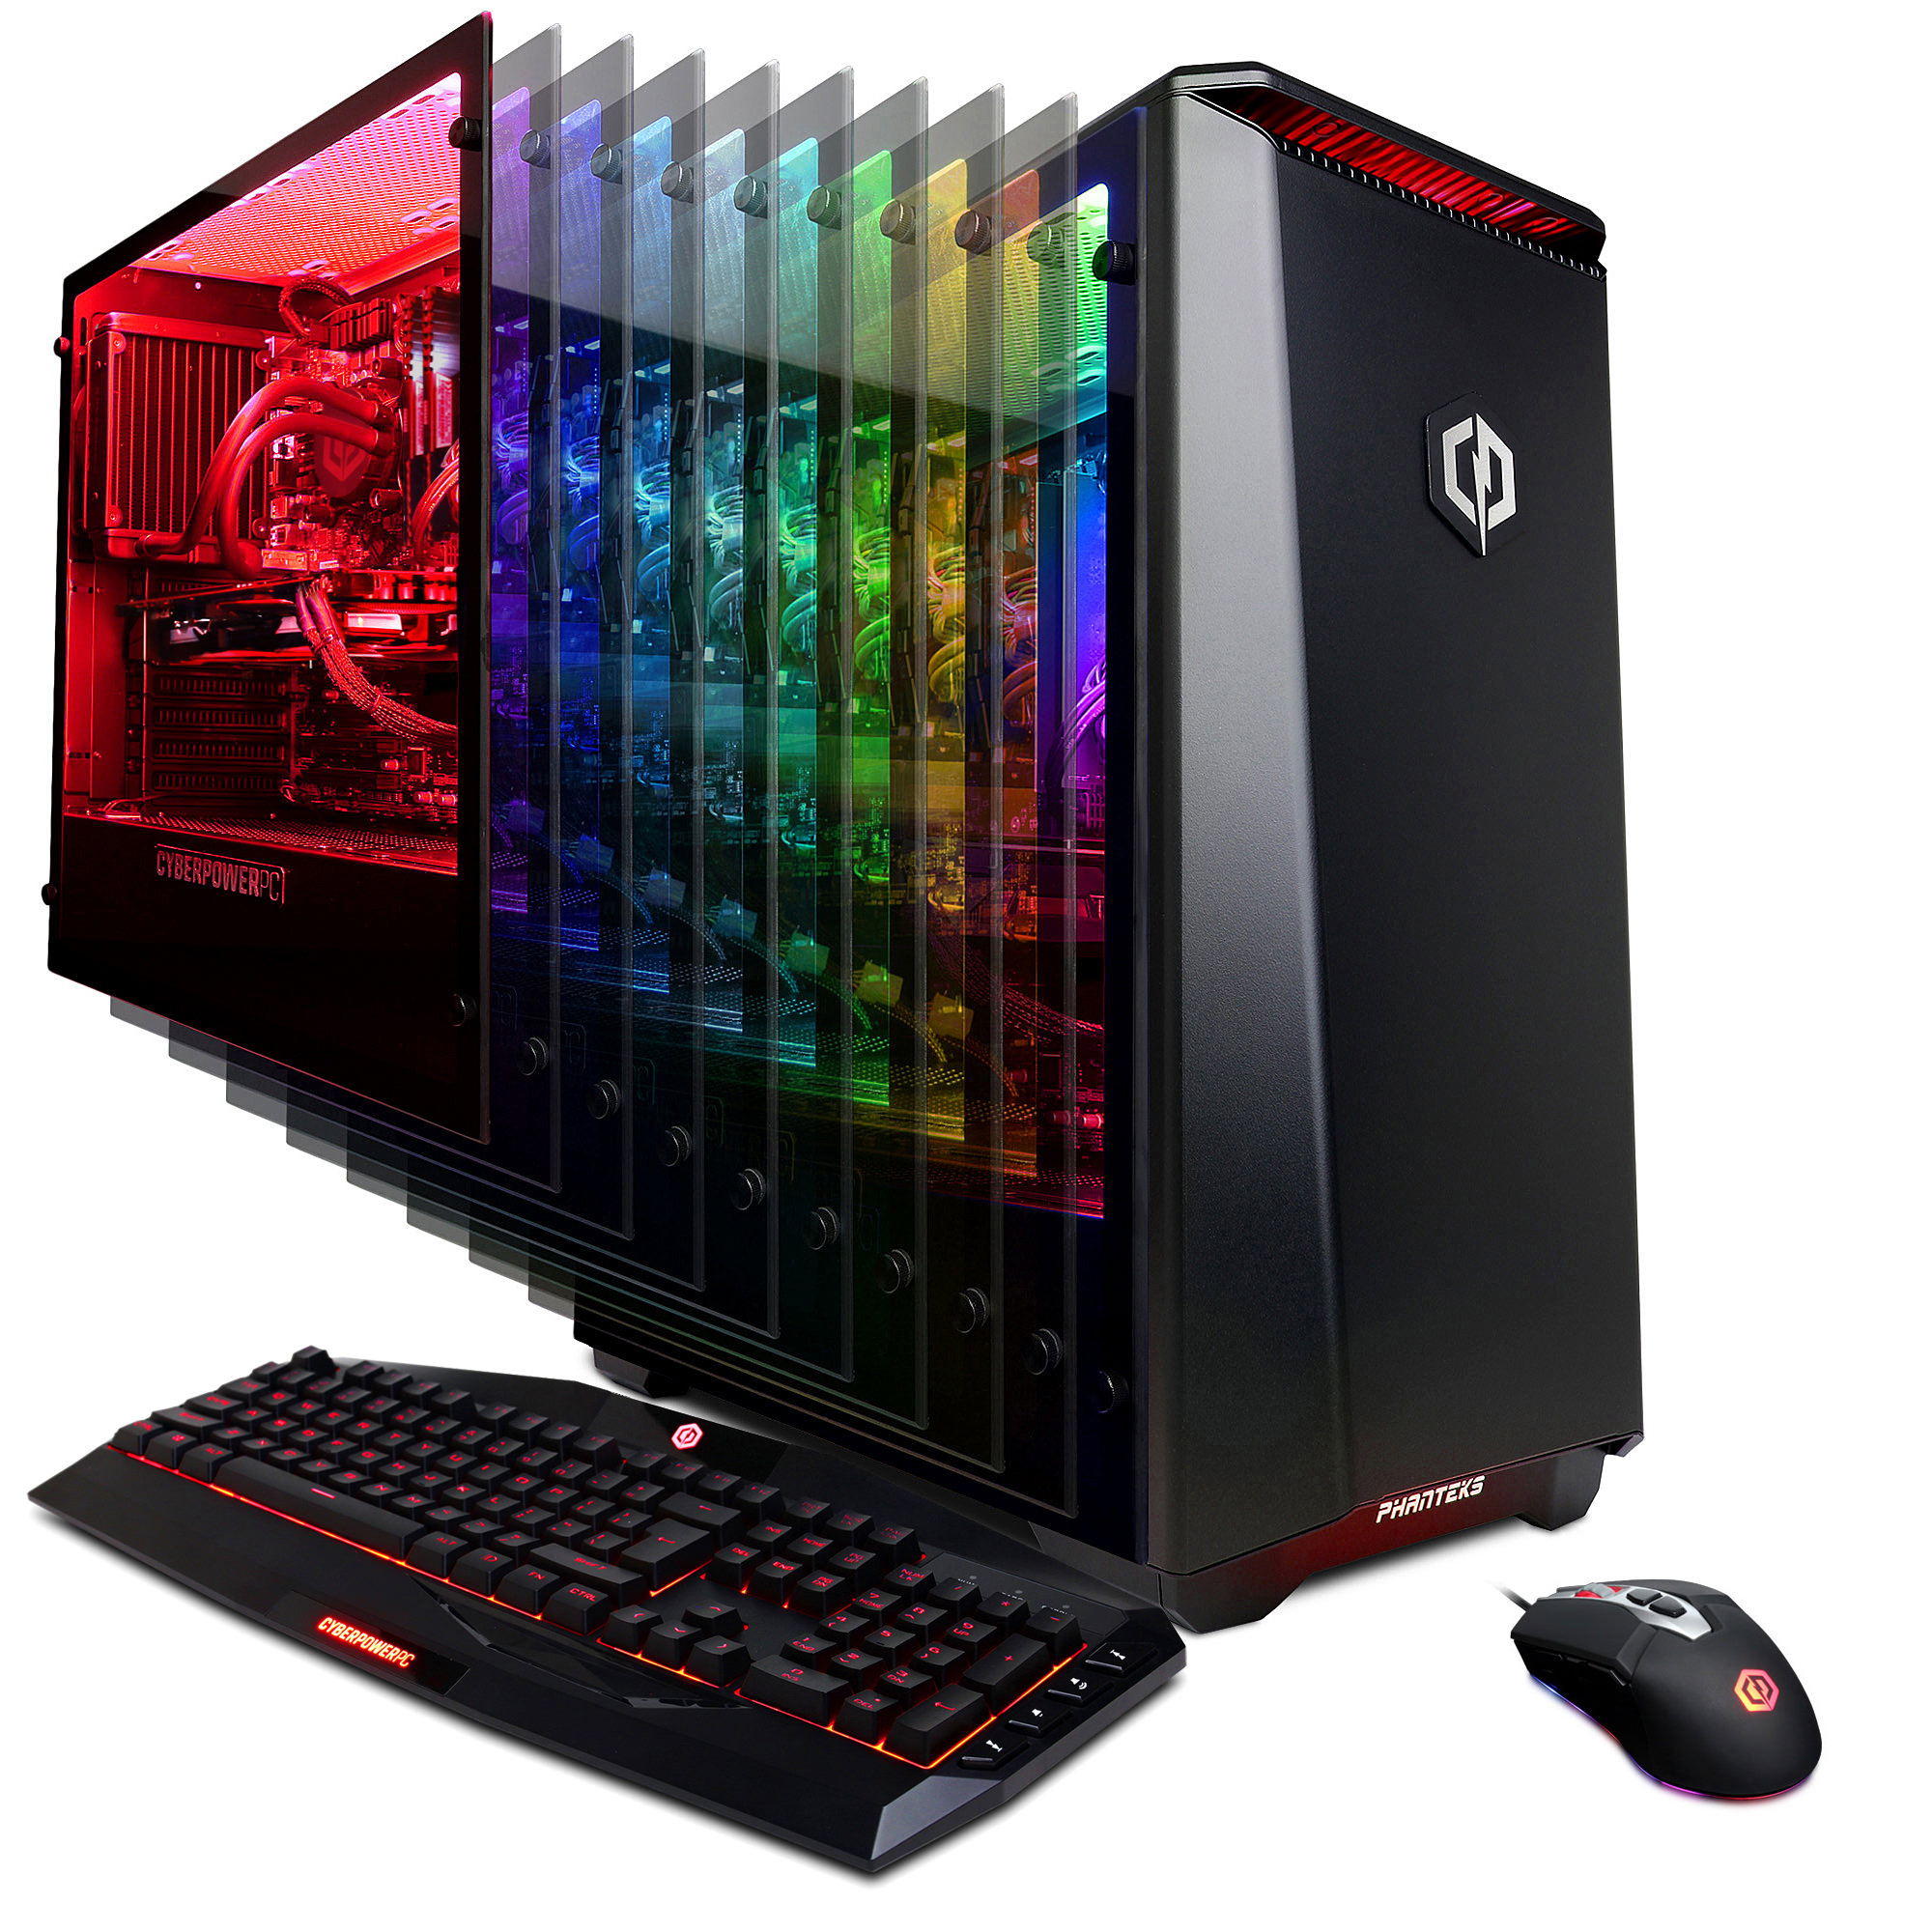 CYBERPOWERPC Gamer Supreme Liquid Cool Gaming Desktop, Intel i9-9900K 3.6GHz, NVIDIA GeForce GTX 1060 6GB, 480GB SSD + 2TB HDD, 16GB DDR4, SLC10680